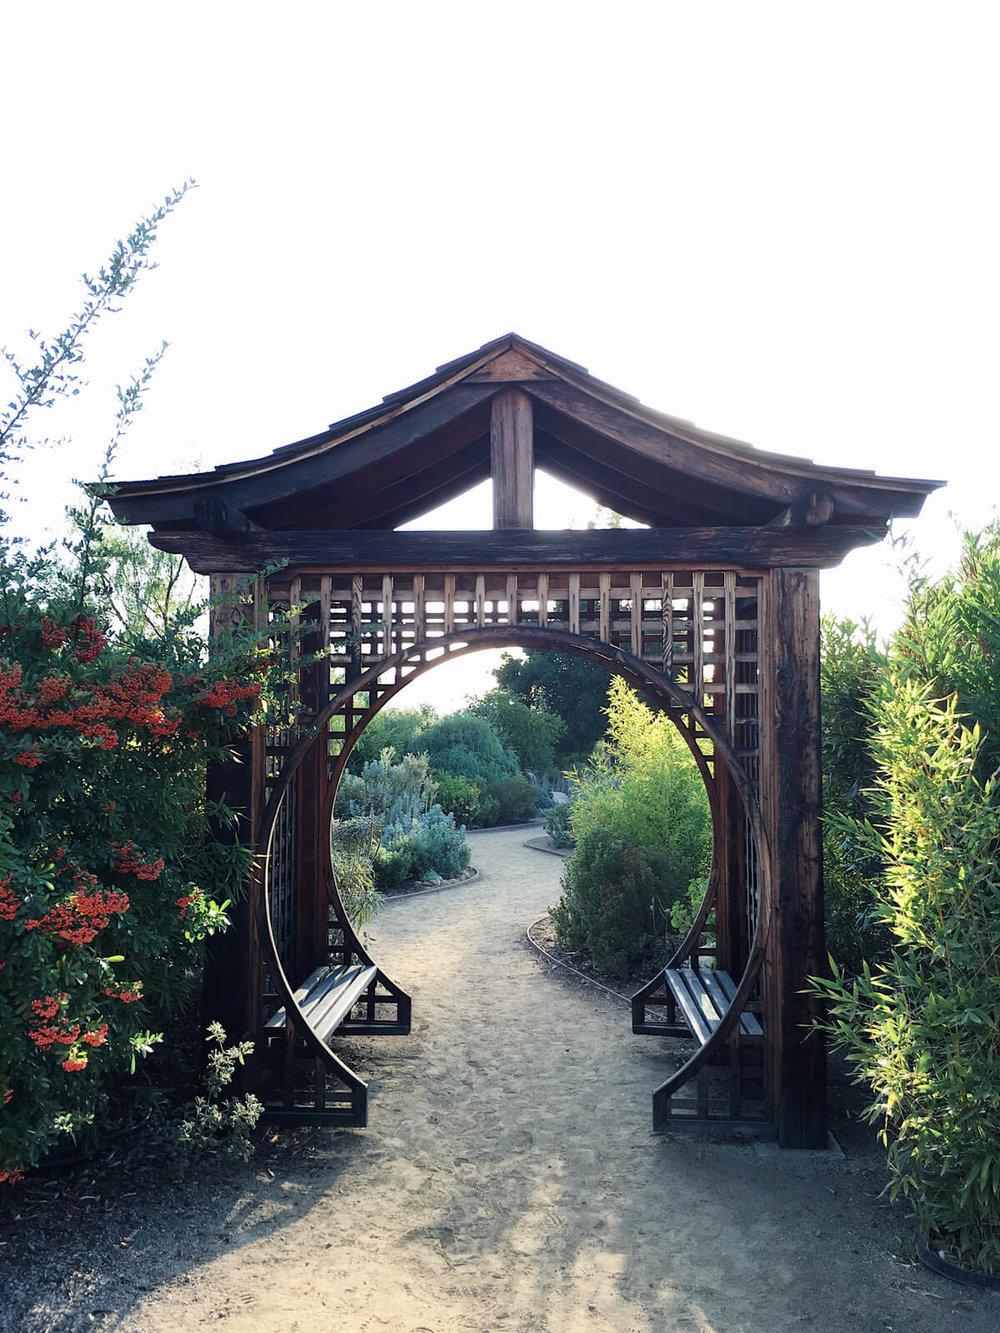 Rachel_Garahan_Ojai-Meditation Mount.jpg